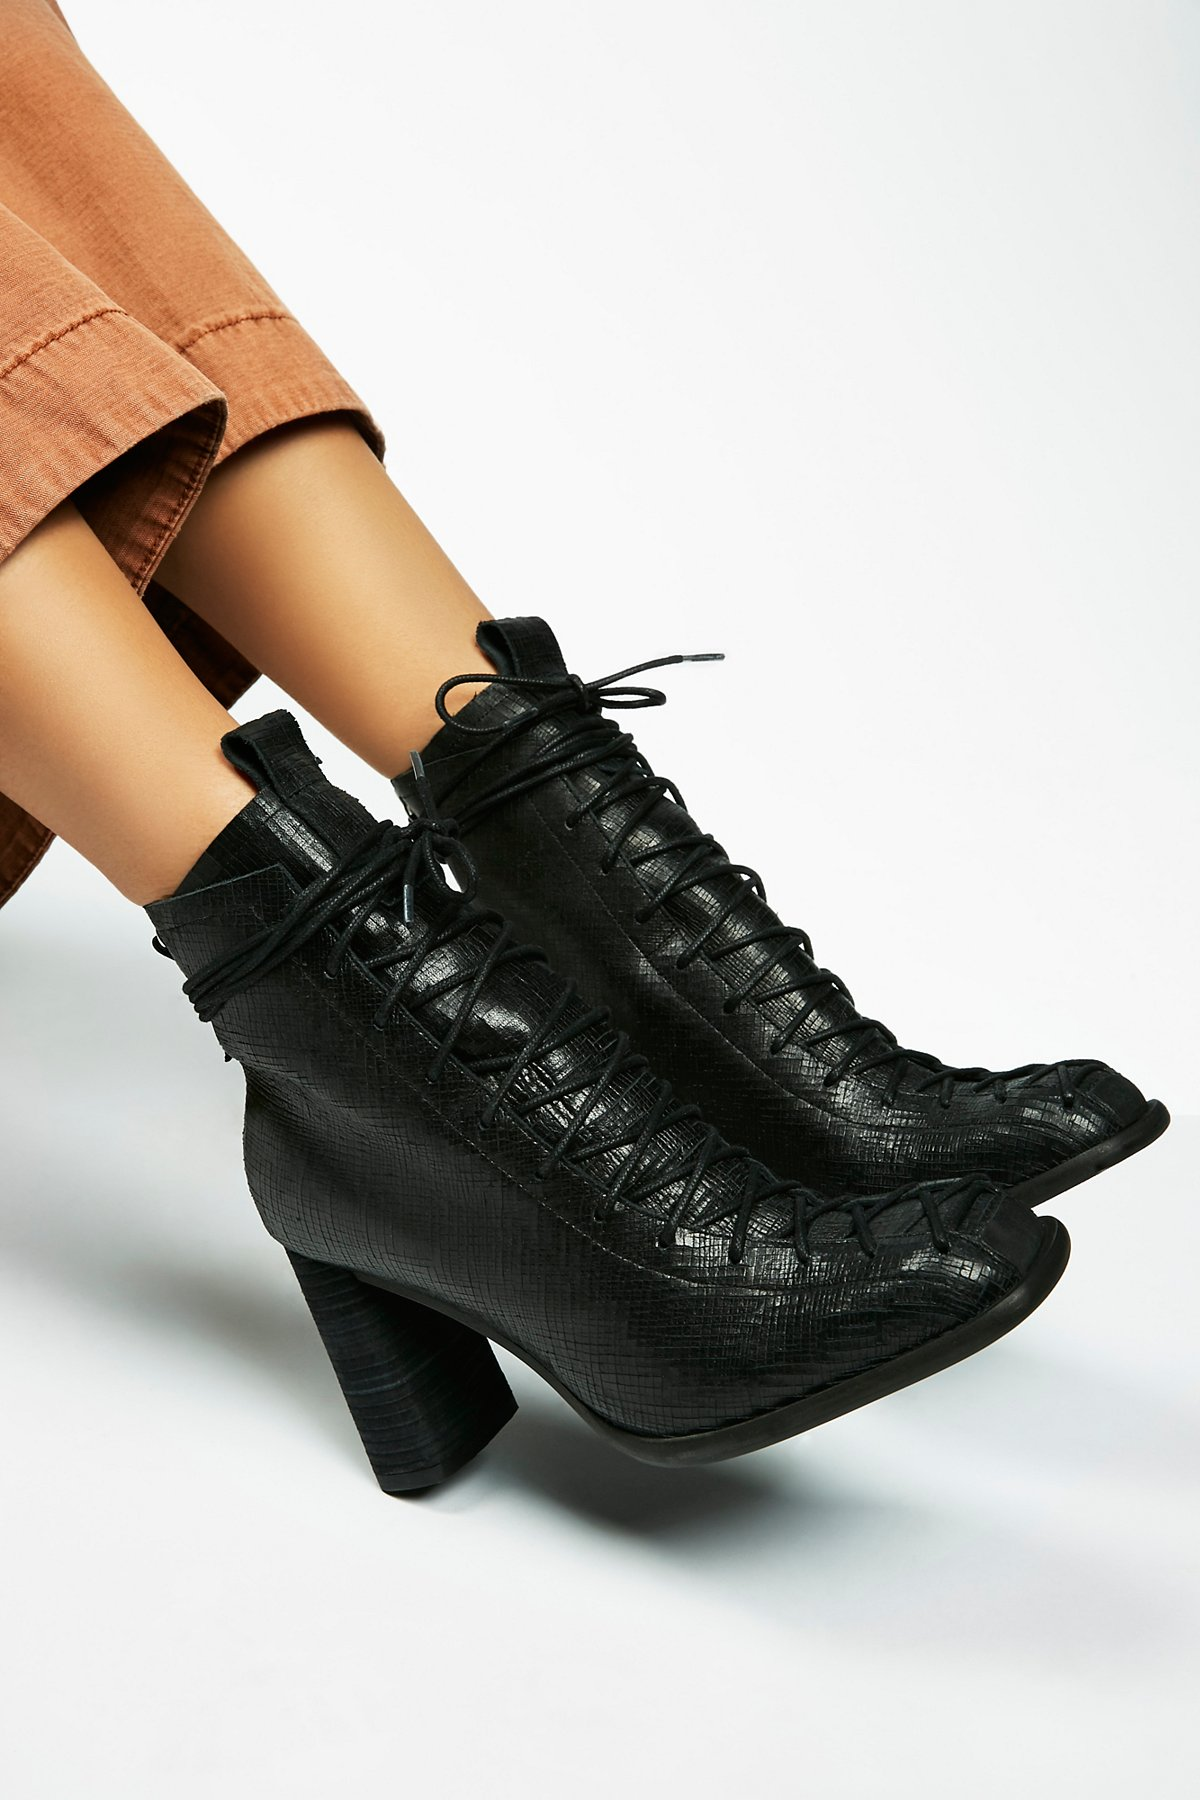 Collectible Heel Boot